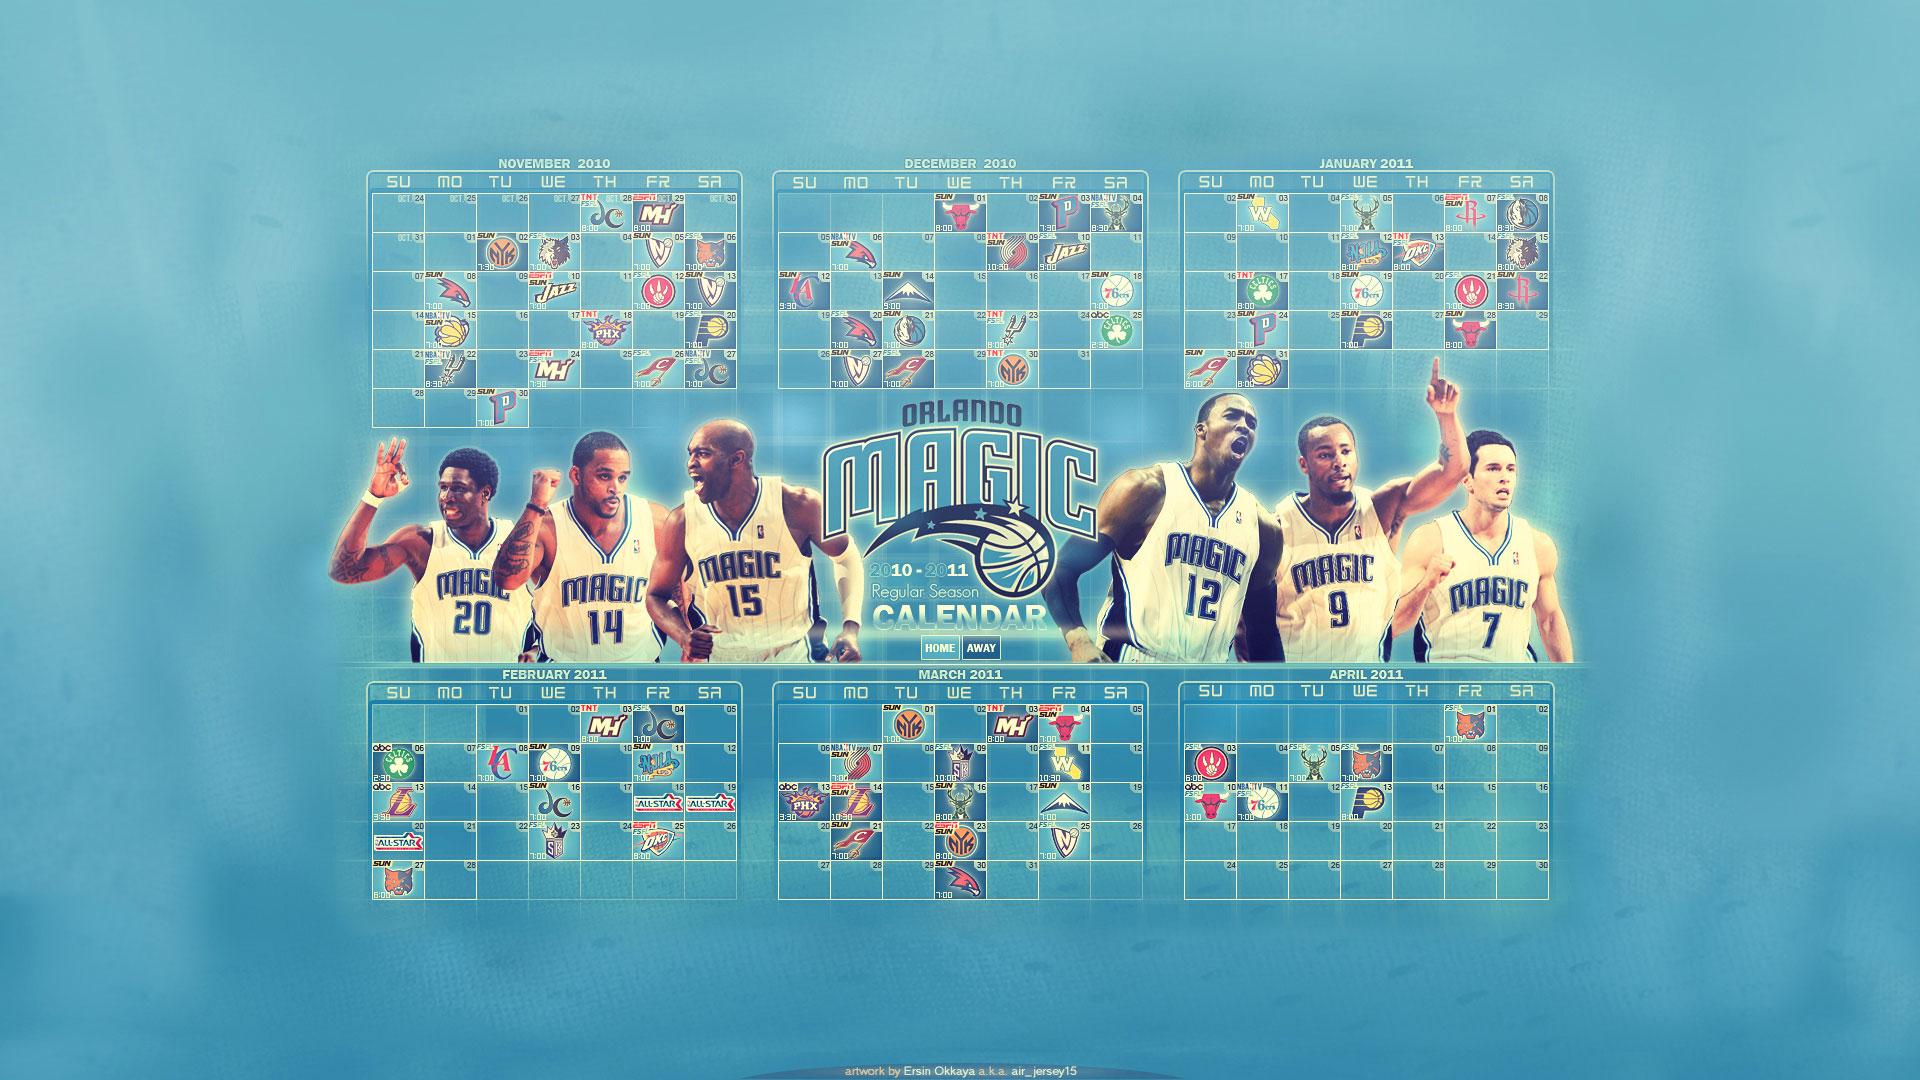 Orlando Magic 2010 11 Schedule Widescreen Wallpaper